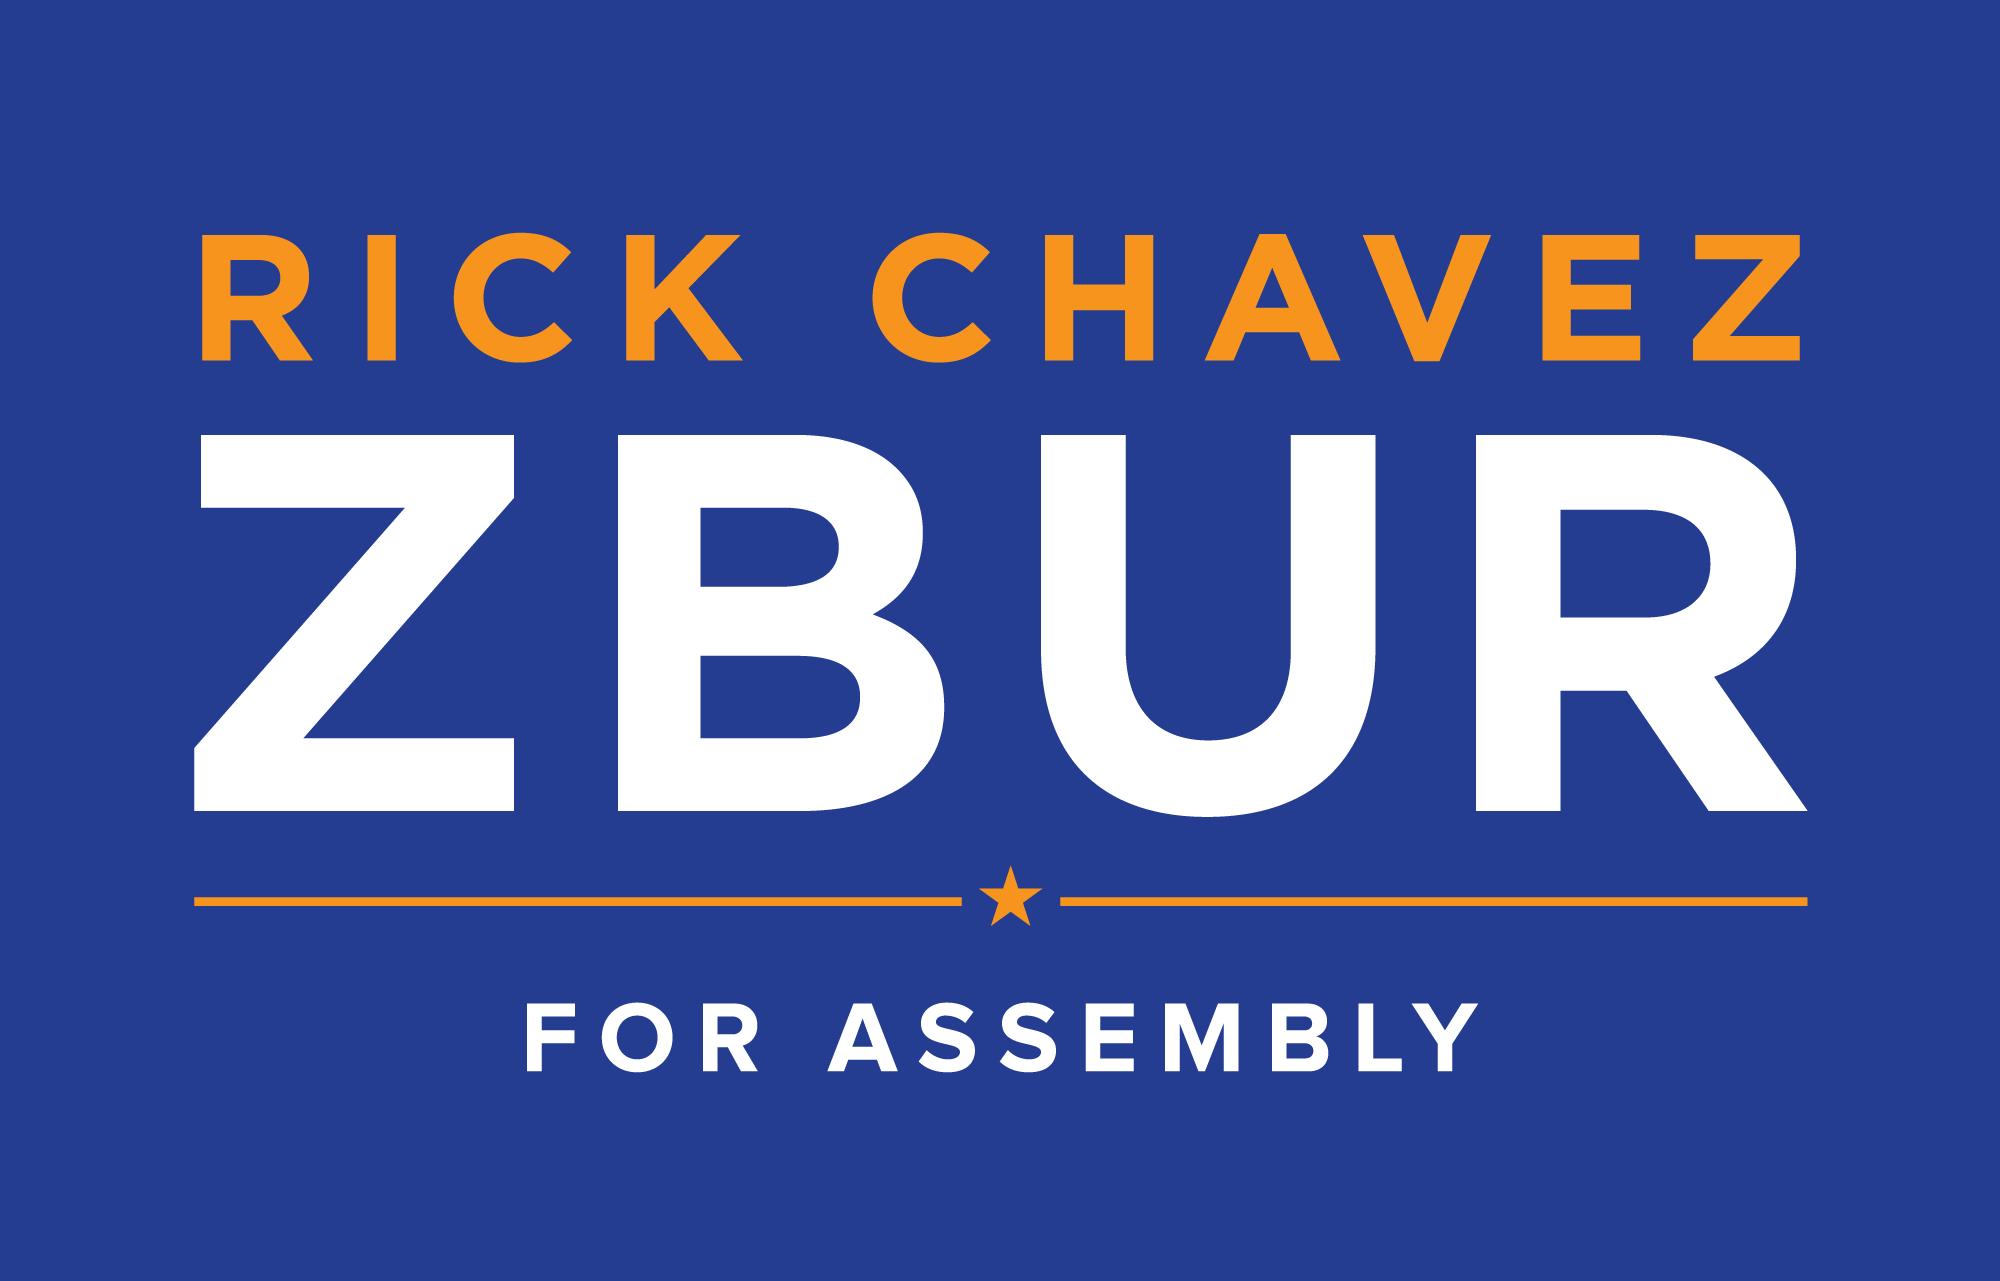 Rick Chavez Zbur for Assembly 2022